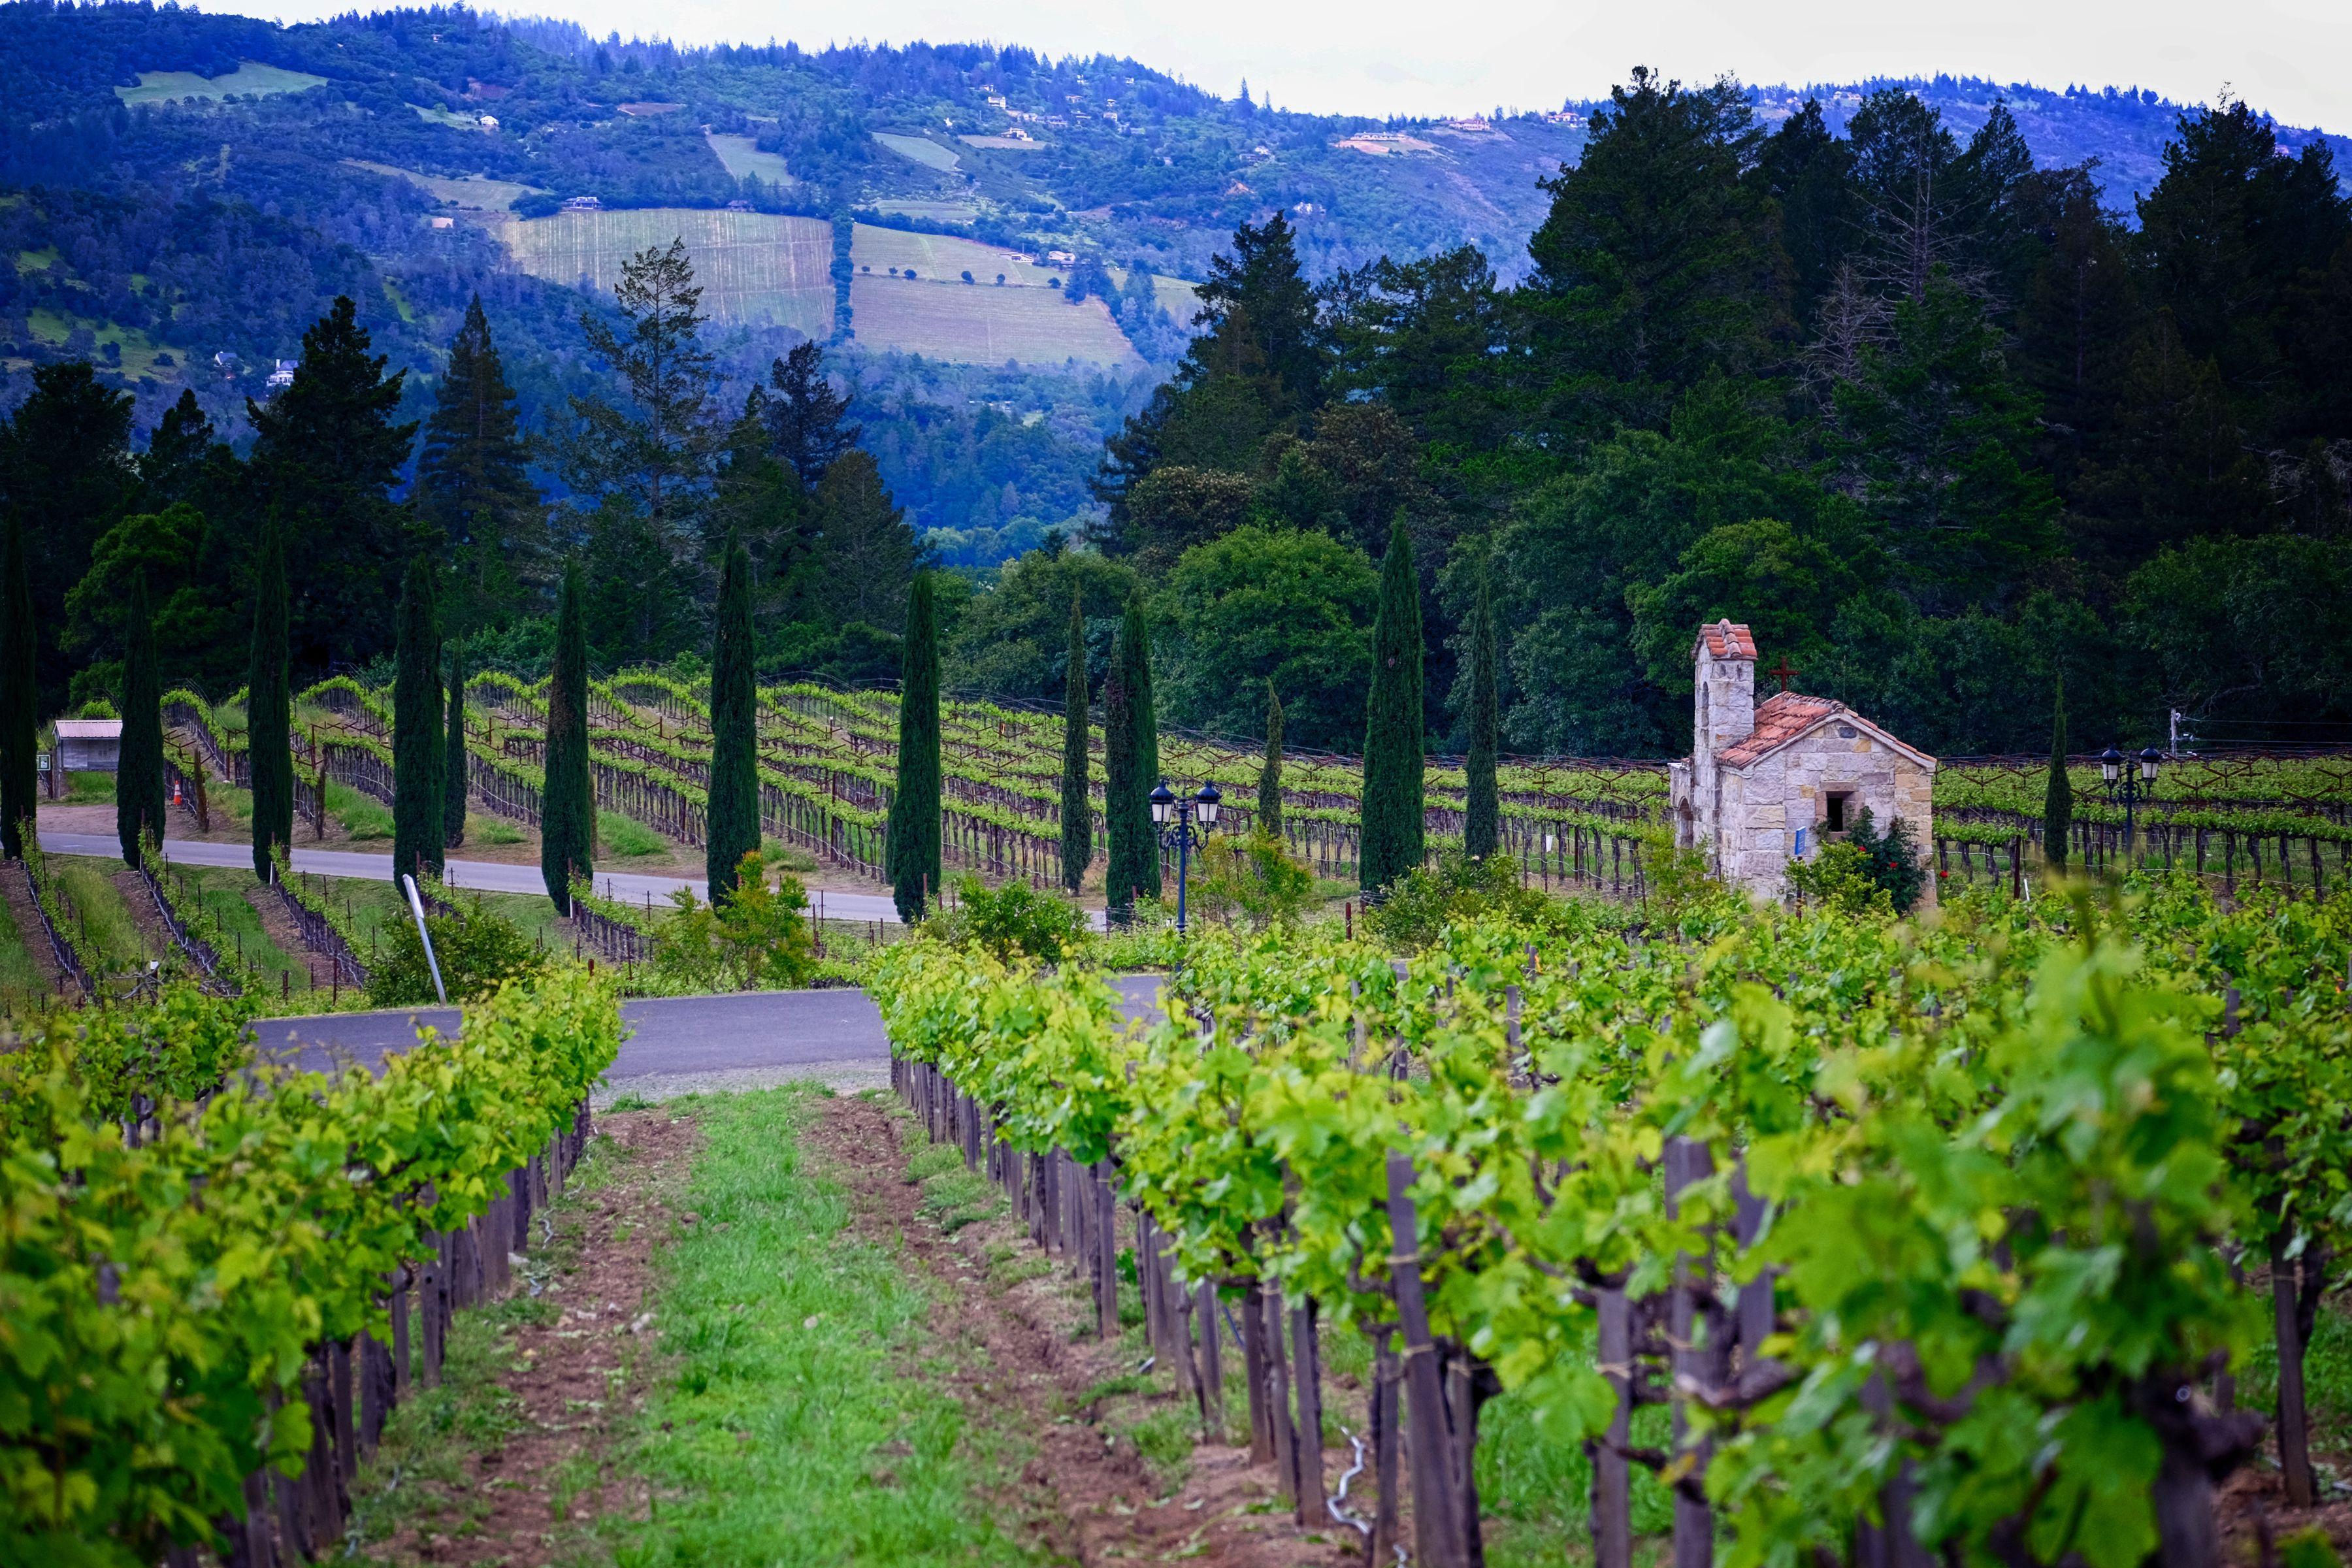 Vineyards in Calistoga, California